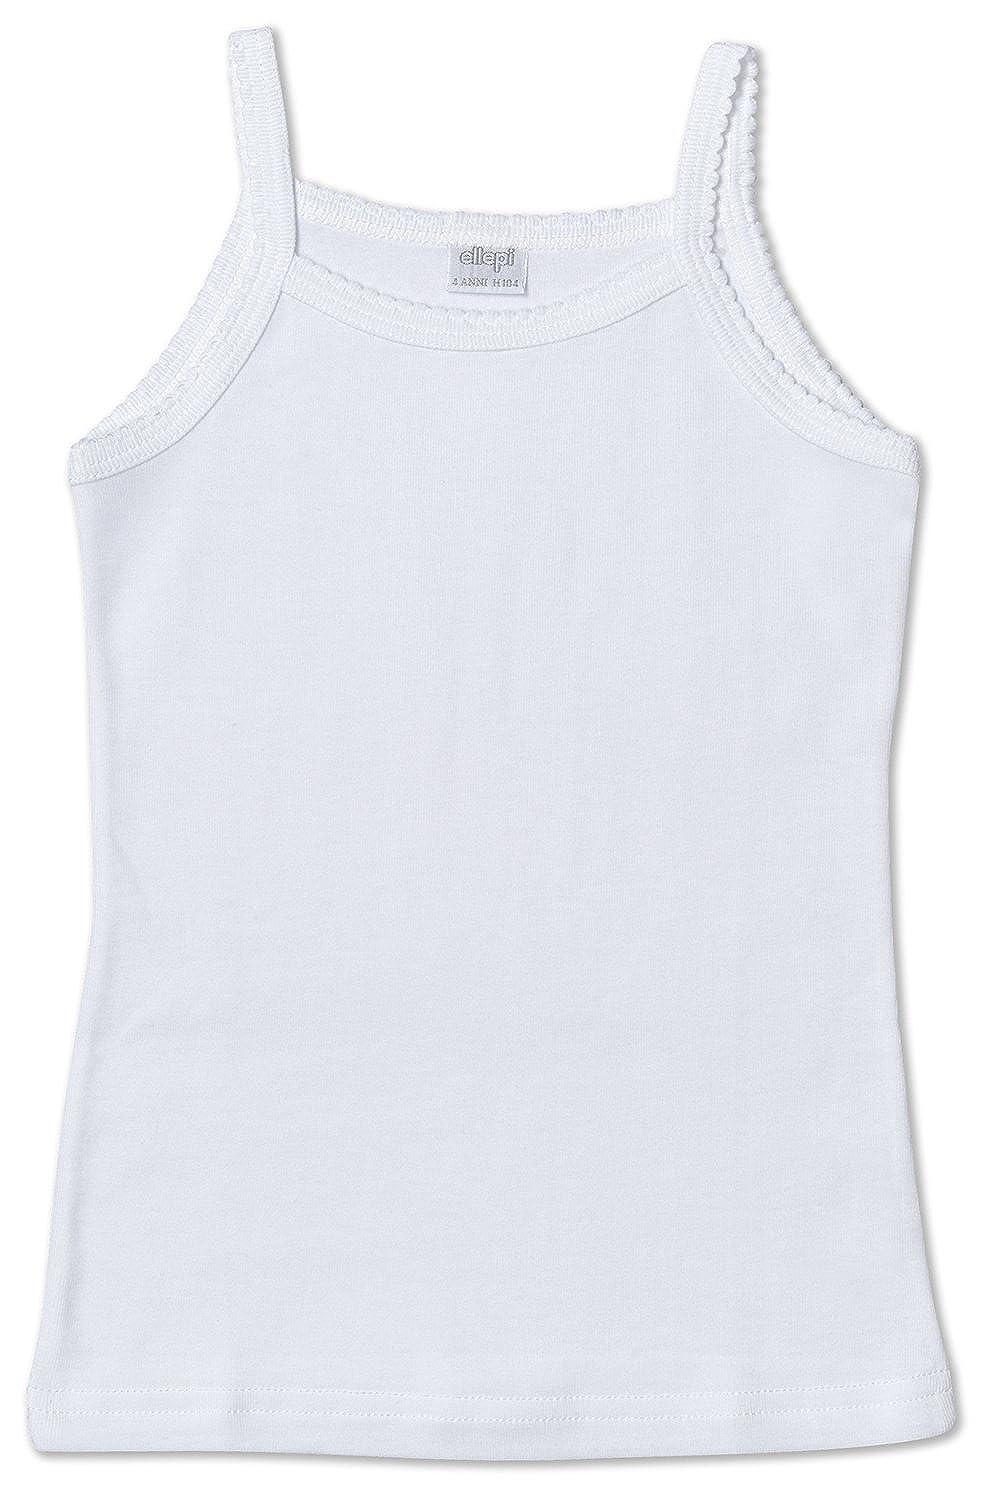 Ellepi AI8228NR Canotta spalla stretta cotone, Bianco